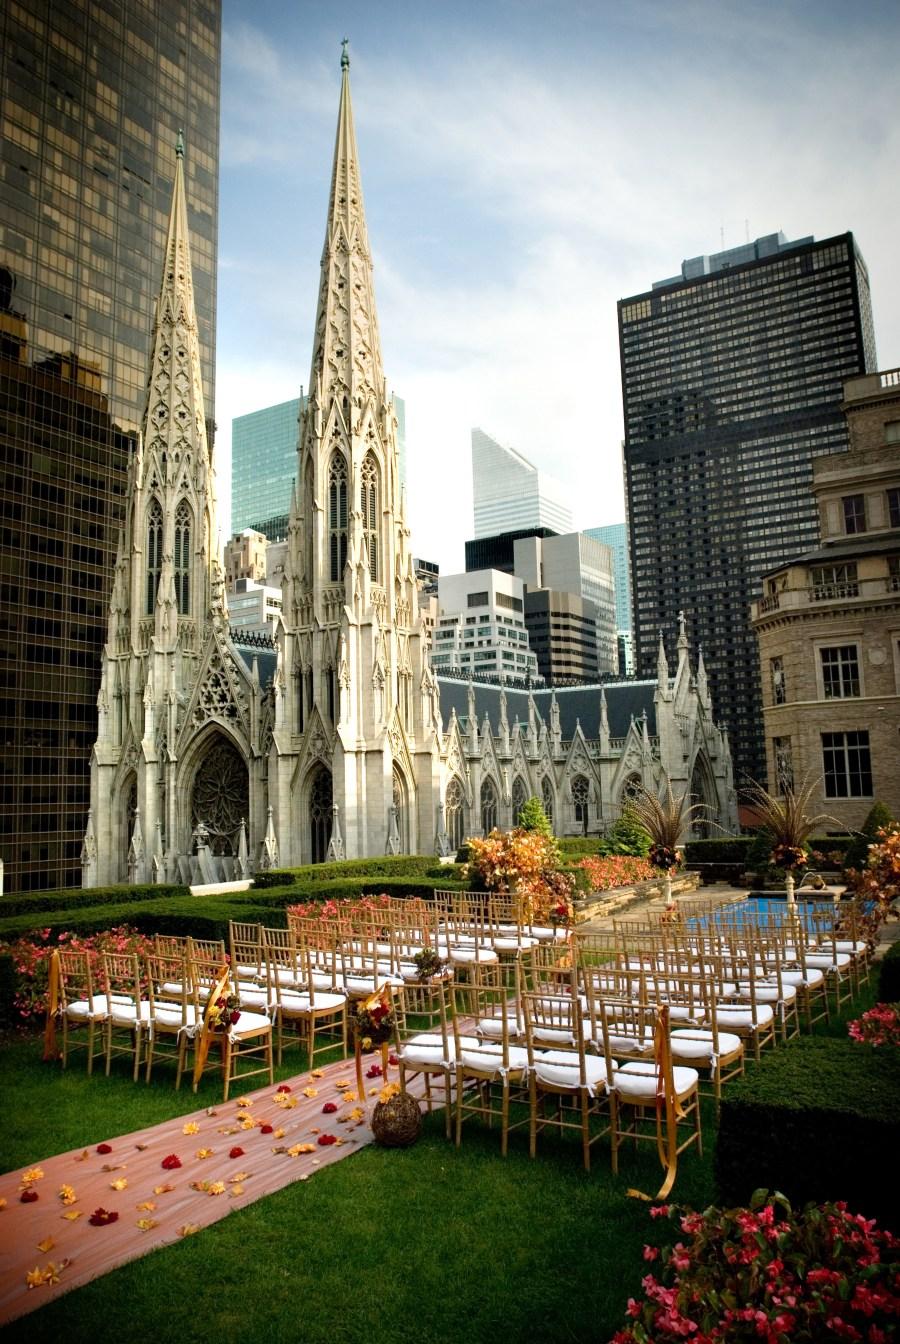 Rooftop Gardens at Rockefeller Center